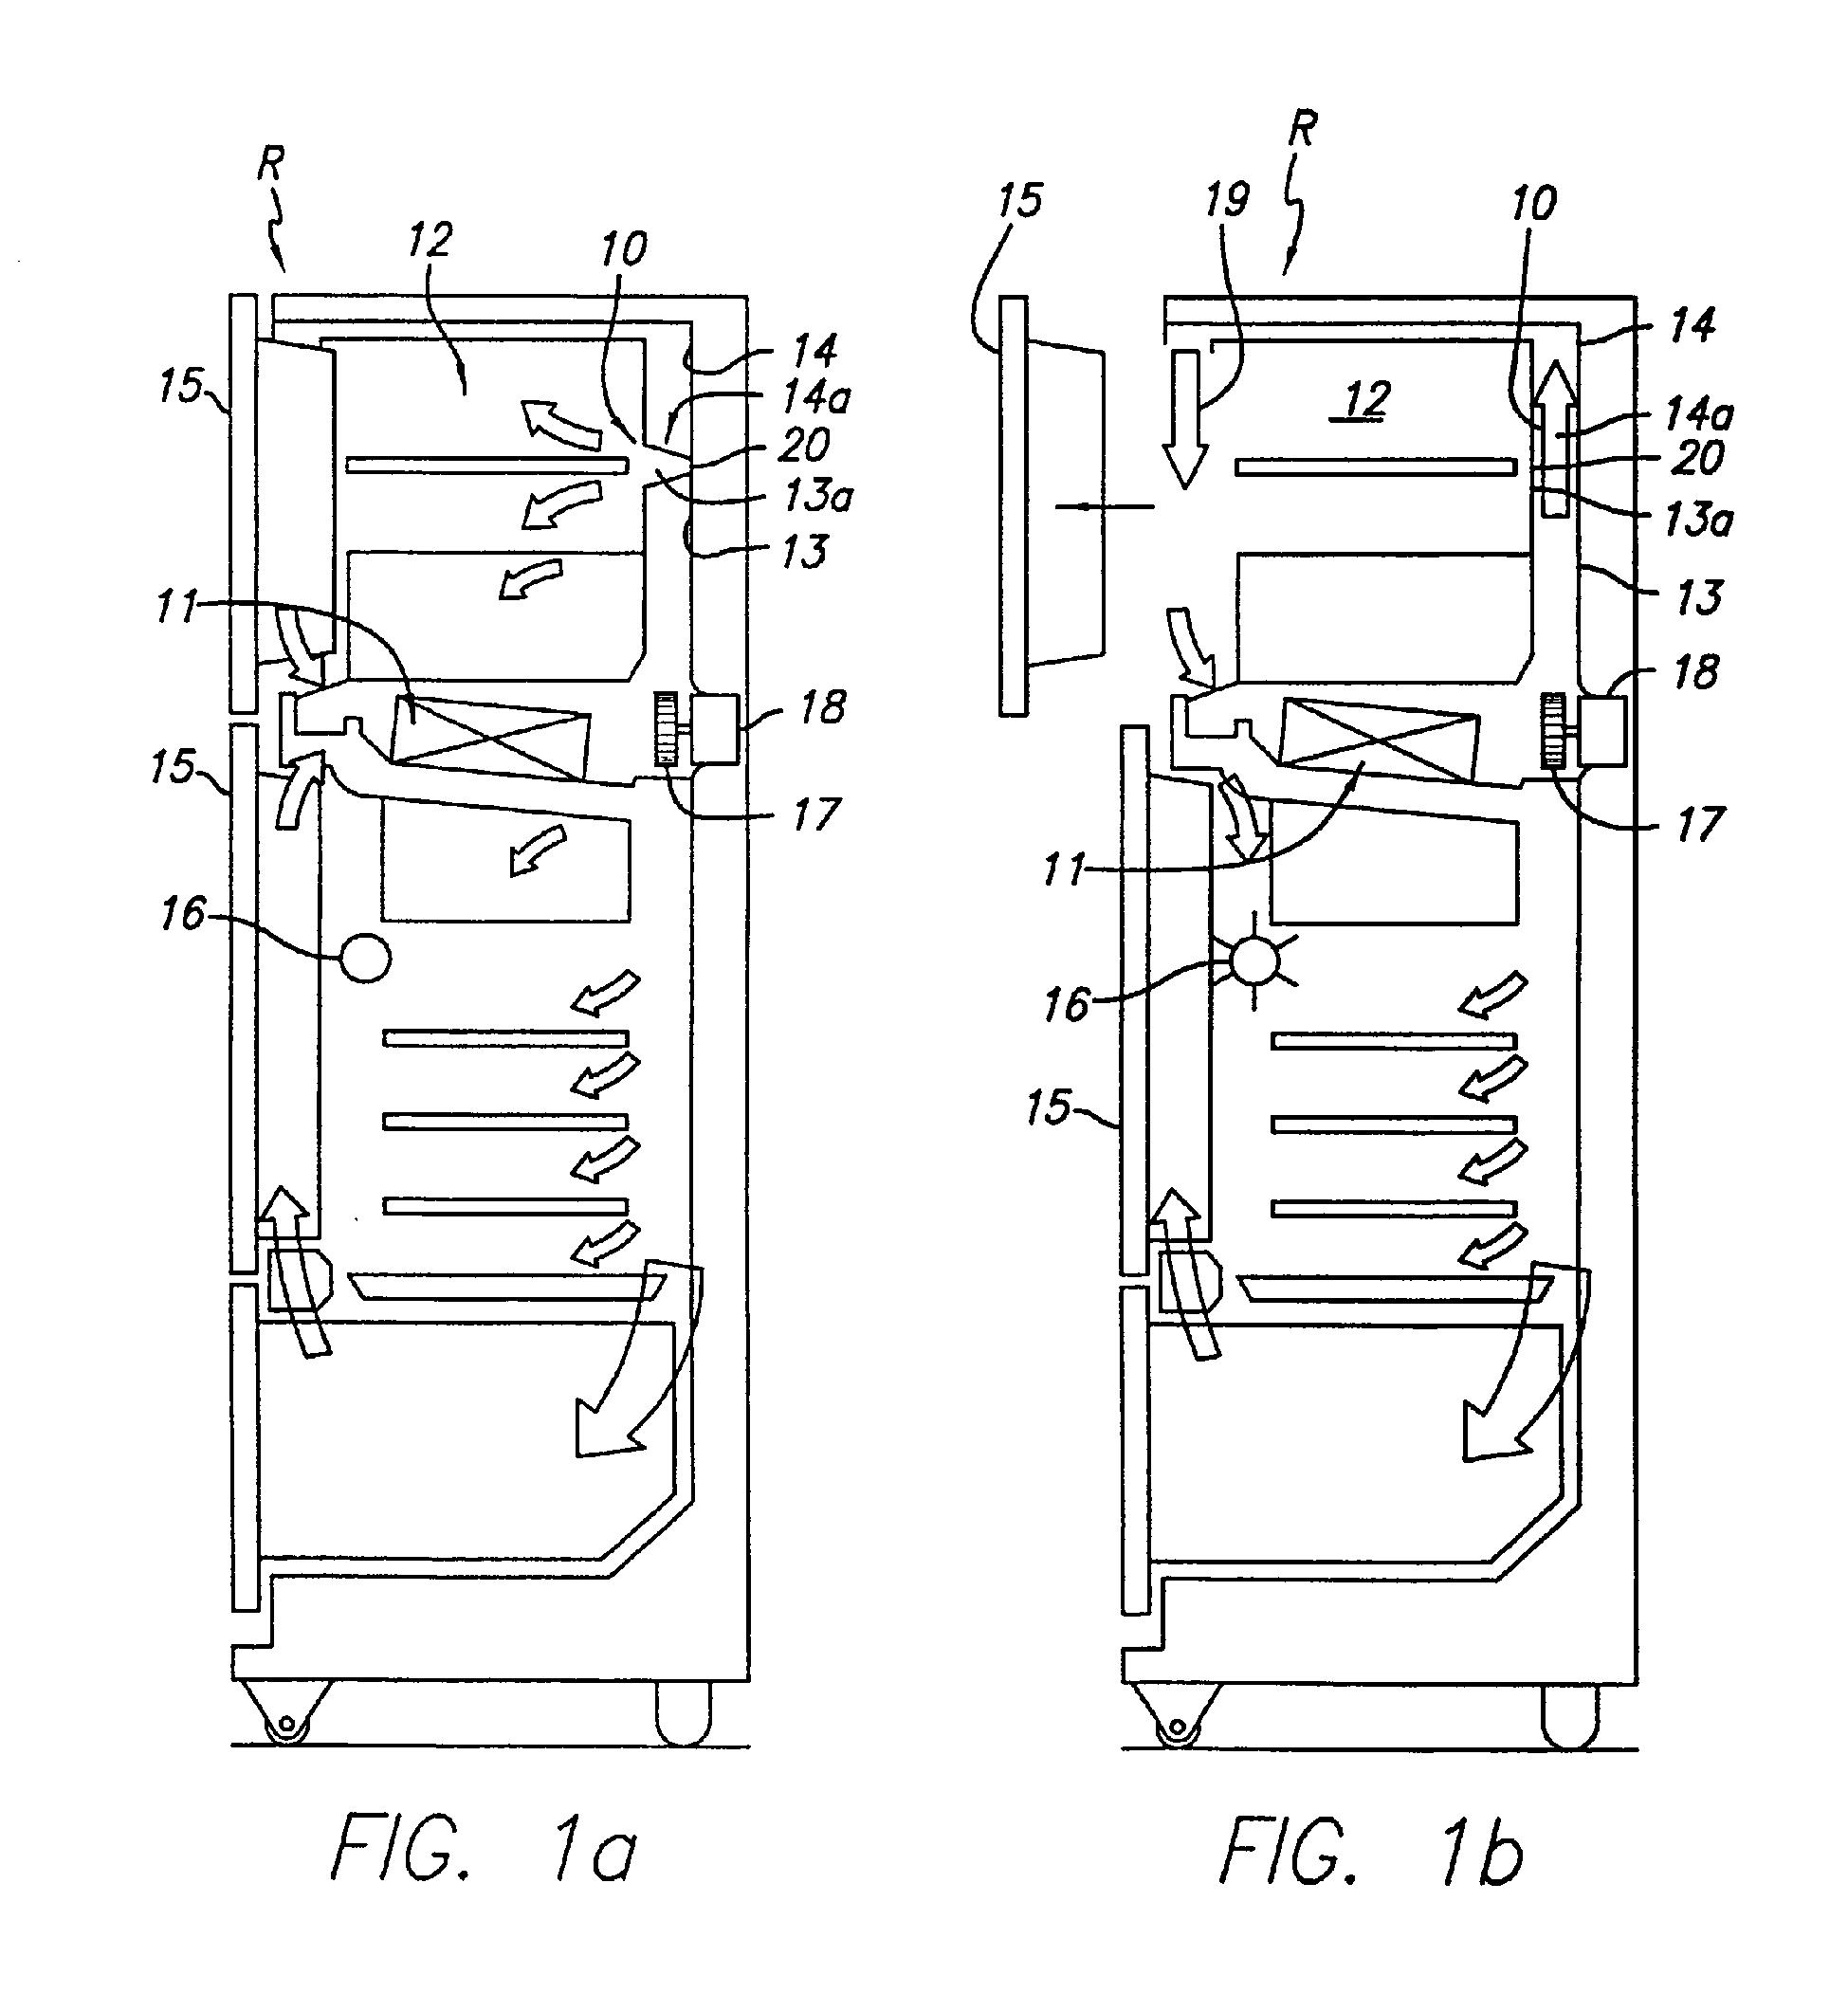 damper door refrigerator  u0026 refrigerator d u0026er assembly  part  wr49x10091  - how to replace